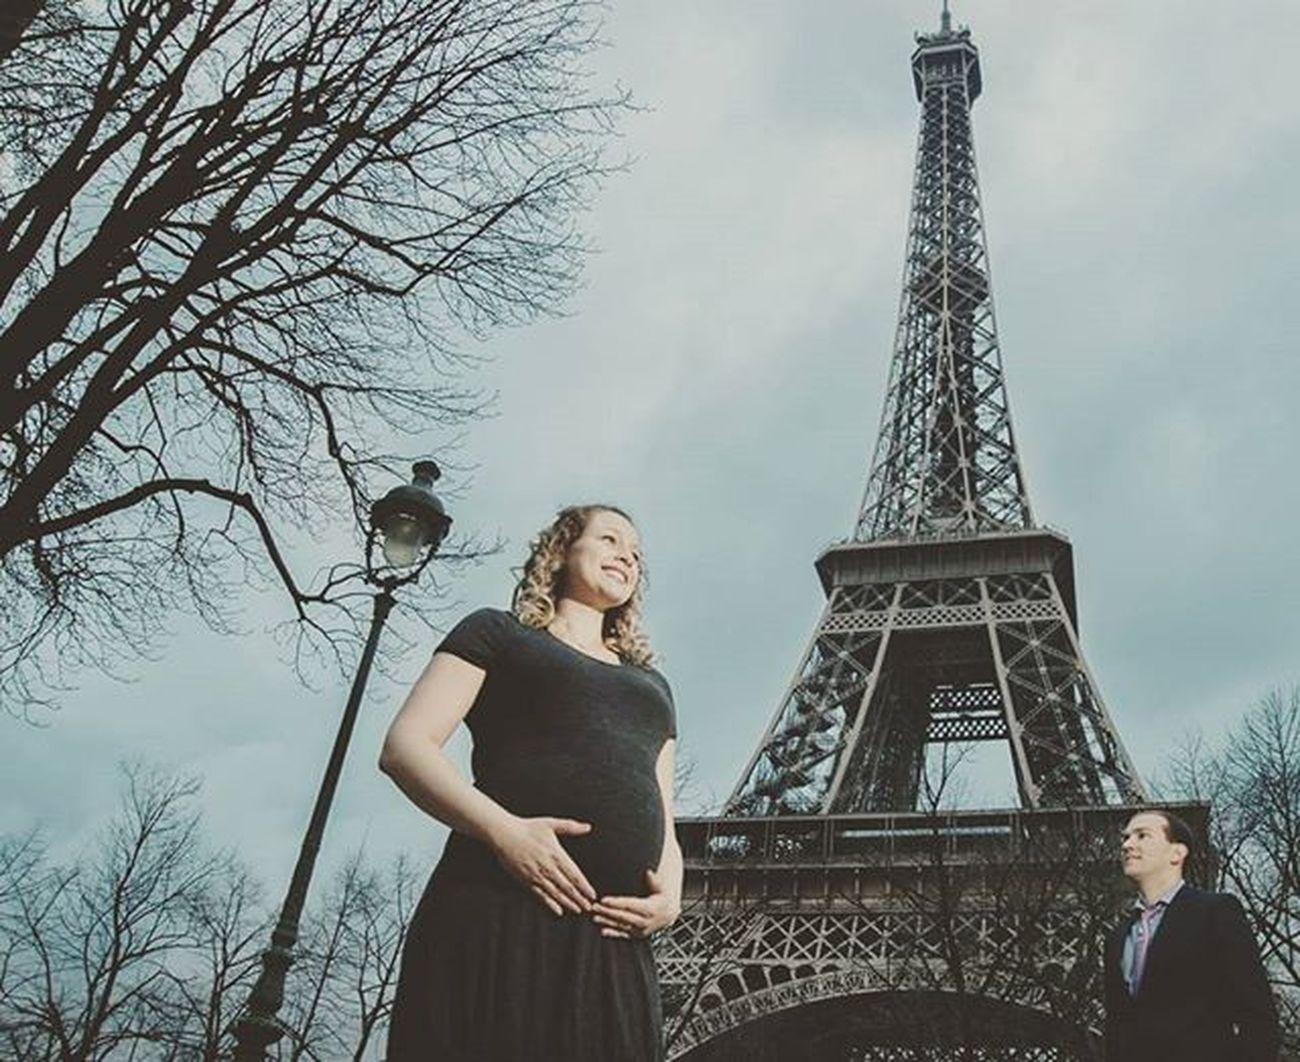 Conexaoparis Torreeiffelparis Eiffeltower Paris Franceparis 263photo Paris263 Fotógrafobrasileiroemparis LoveParis Paris Love Bestshots Photolovers Ensaiogestante Gestante Gestantes Gravidez Fotografiagestante Alexgarciafotografia